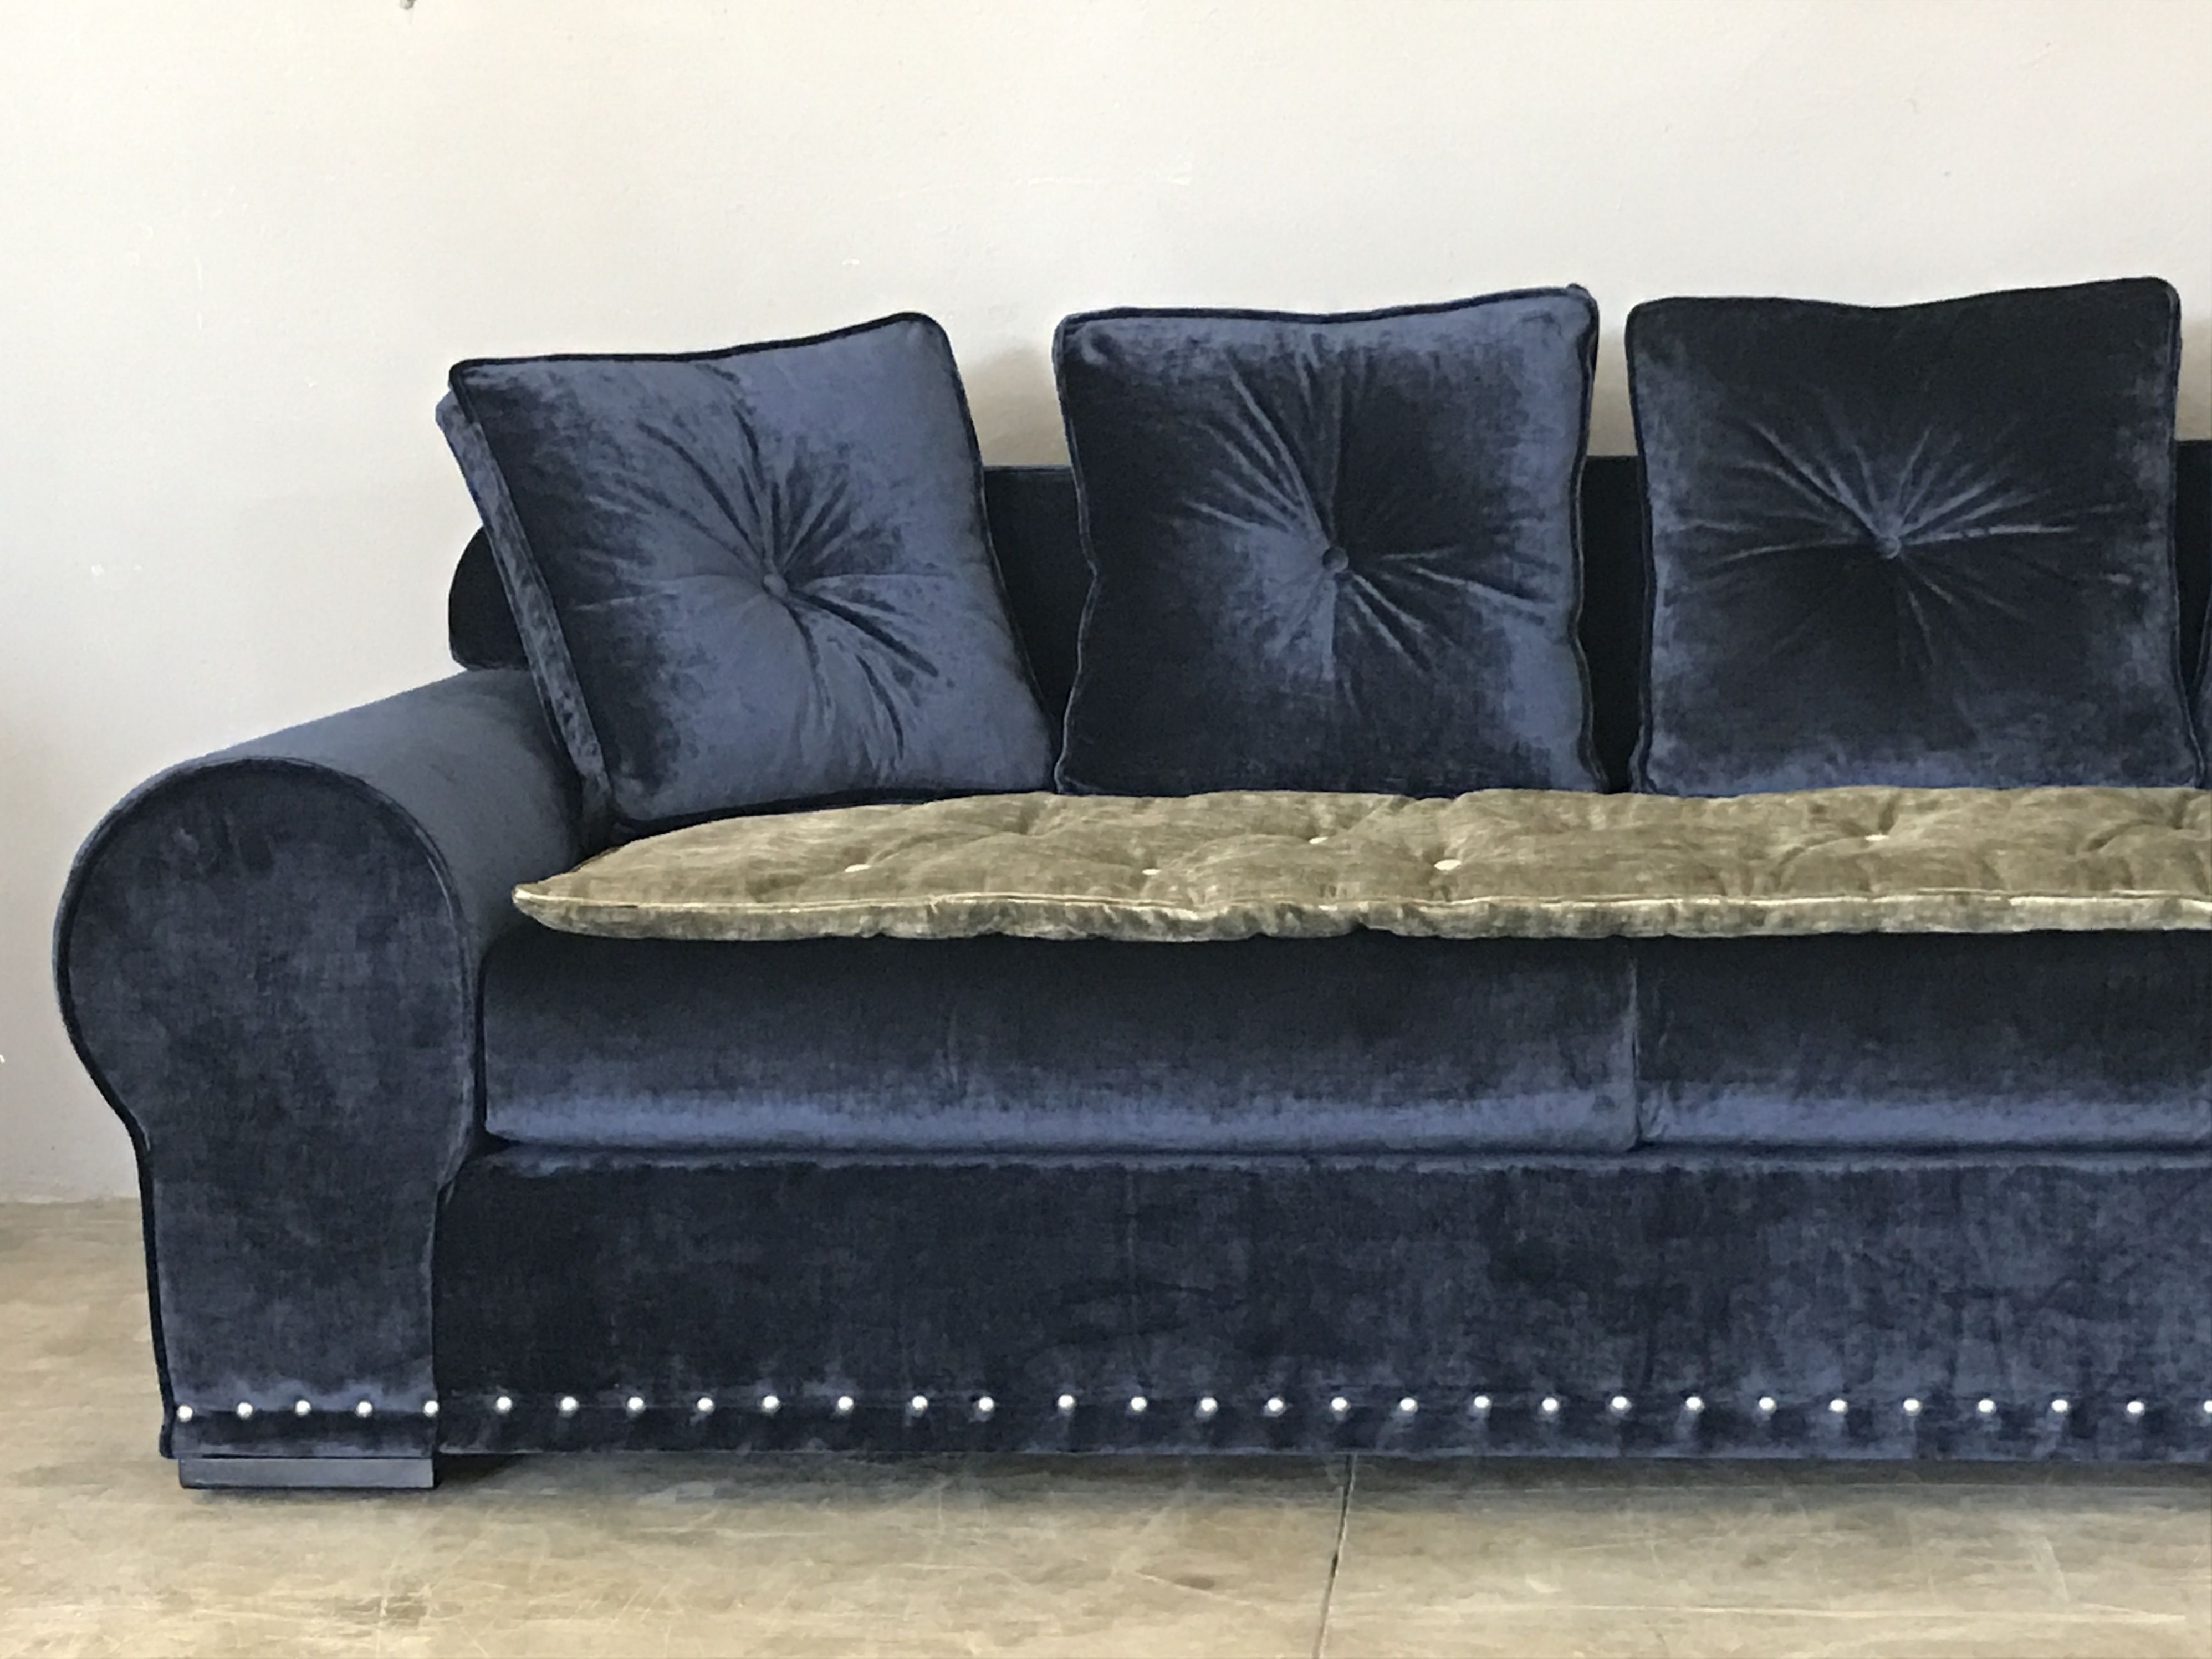 Alinea Canapé Convertible Frais Galerie Maha De Canapé Bleu Turquoise Mahagranda De Home